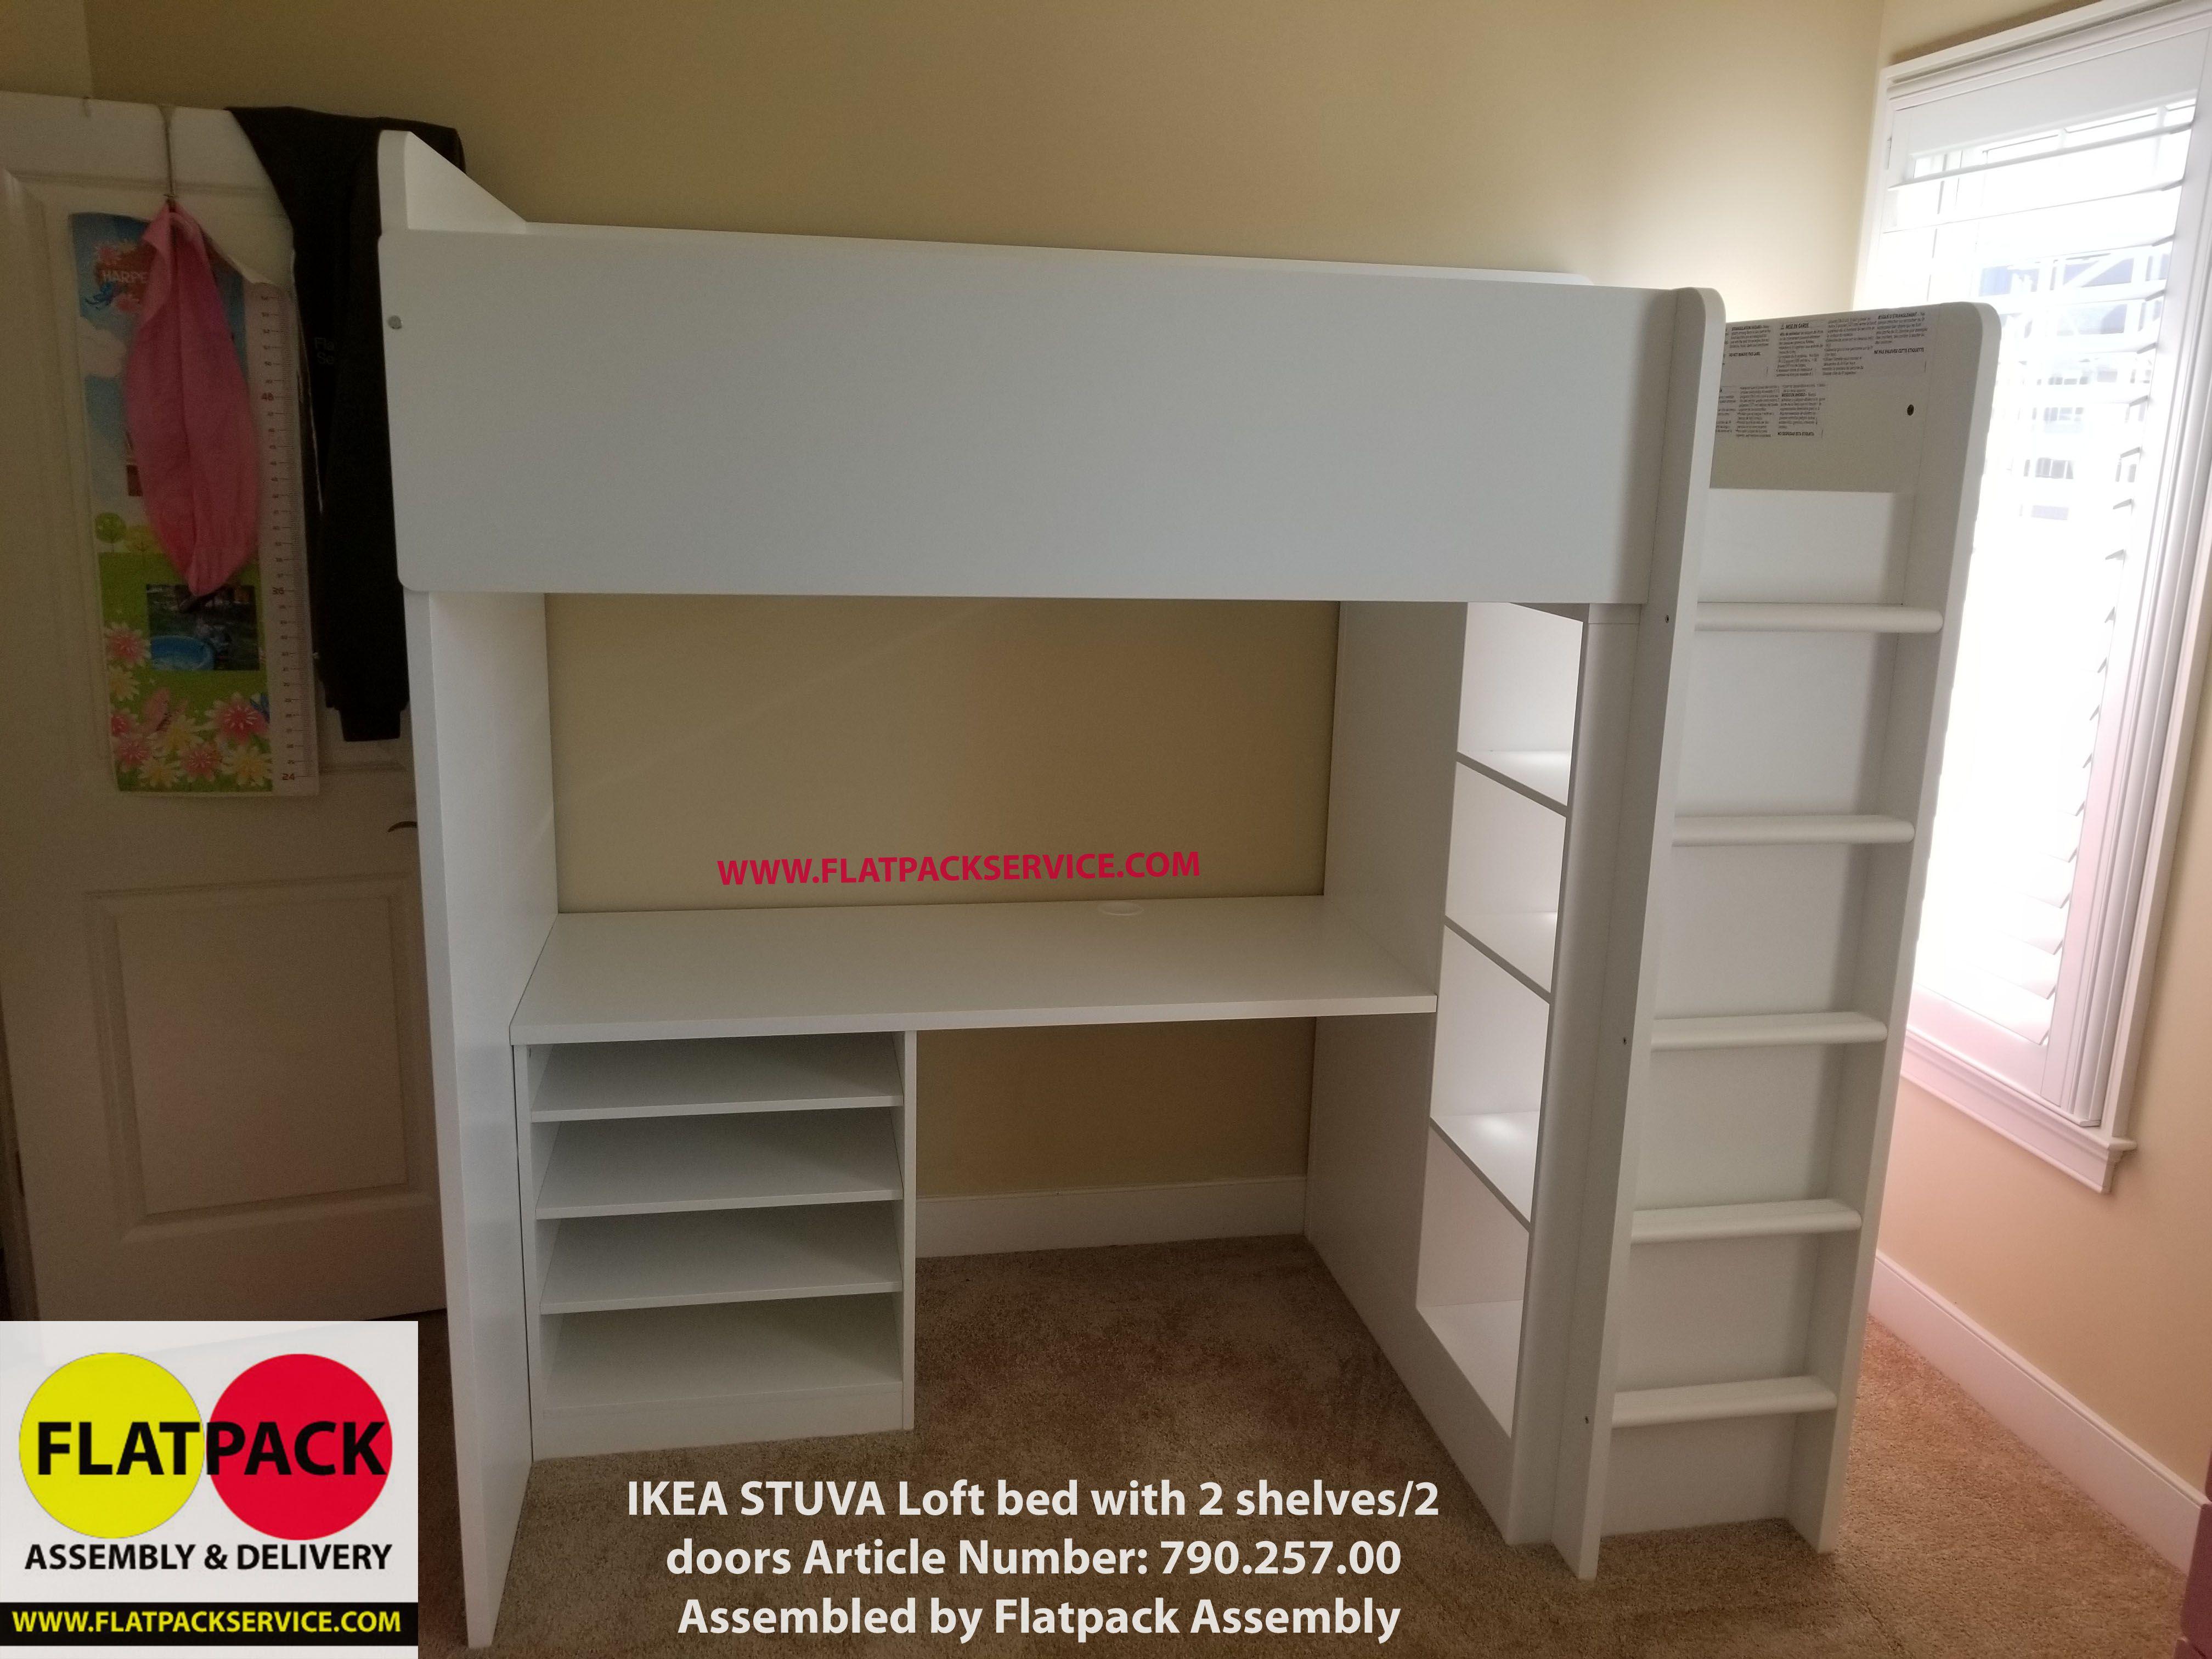 202 277-5911 Best Furniture Assembly Service in Beltsville ...